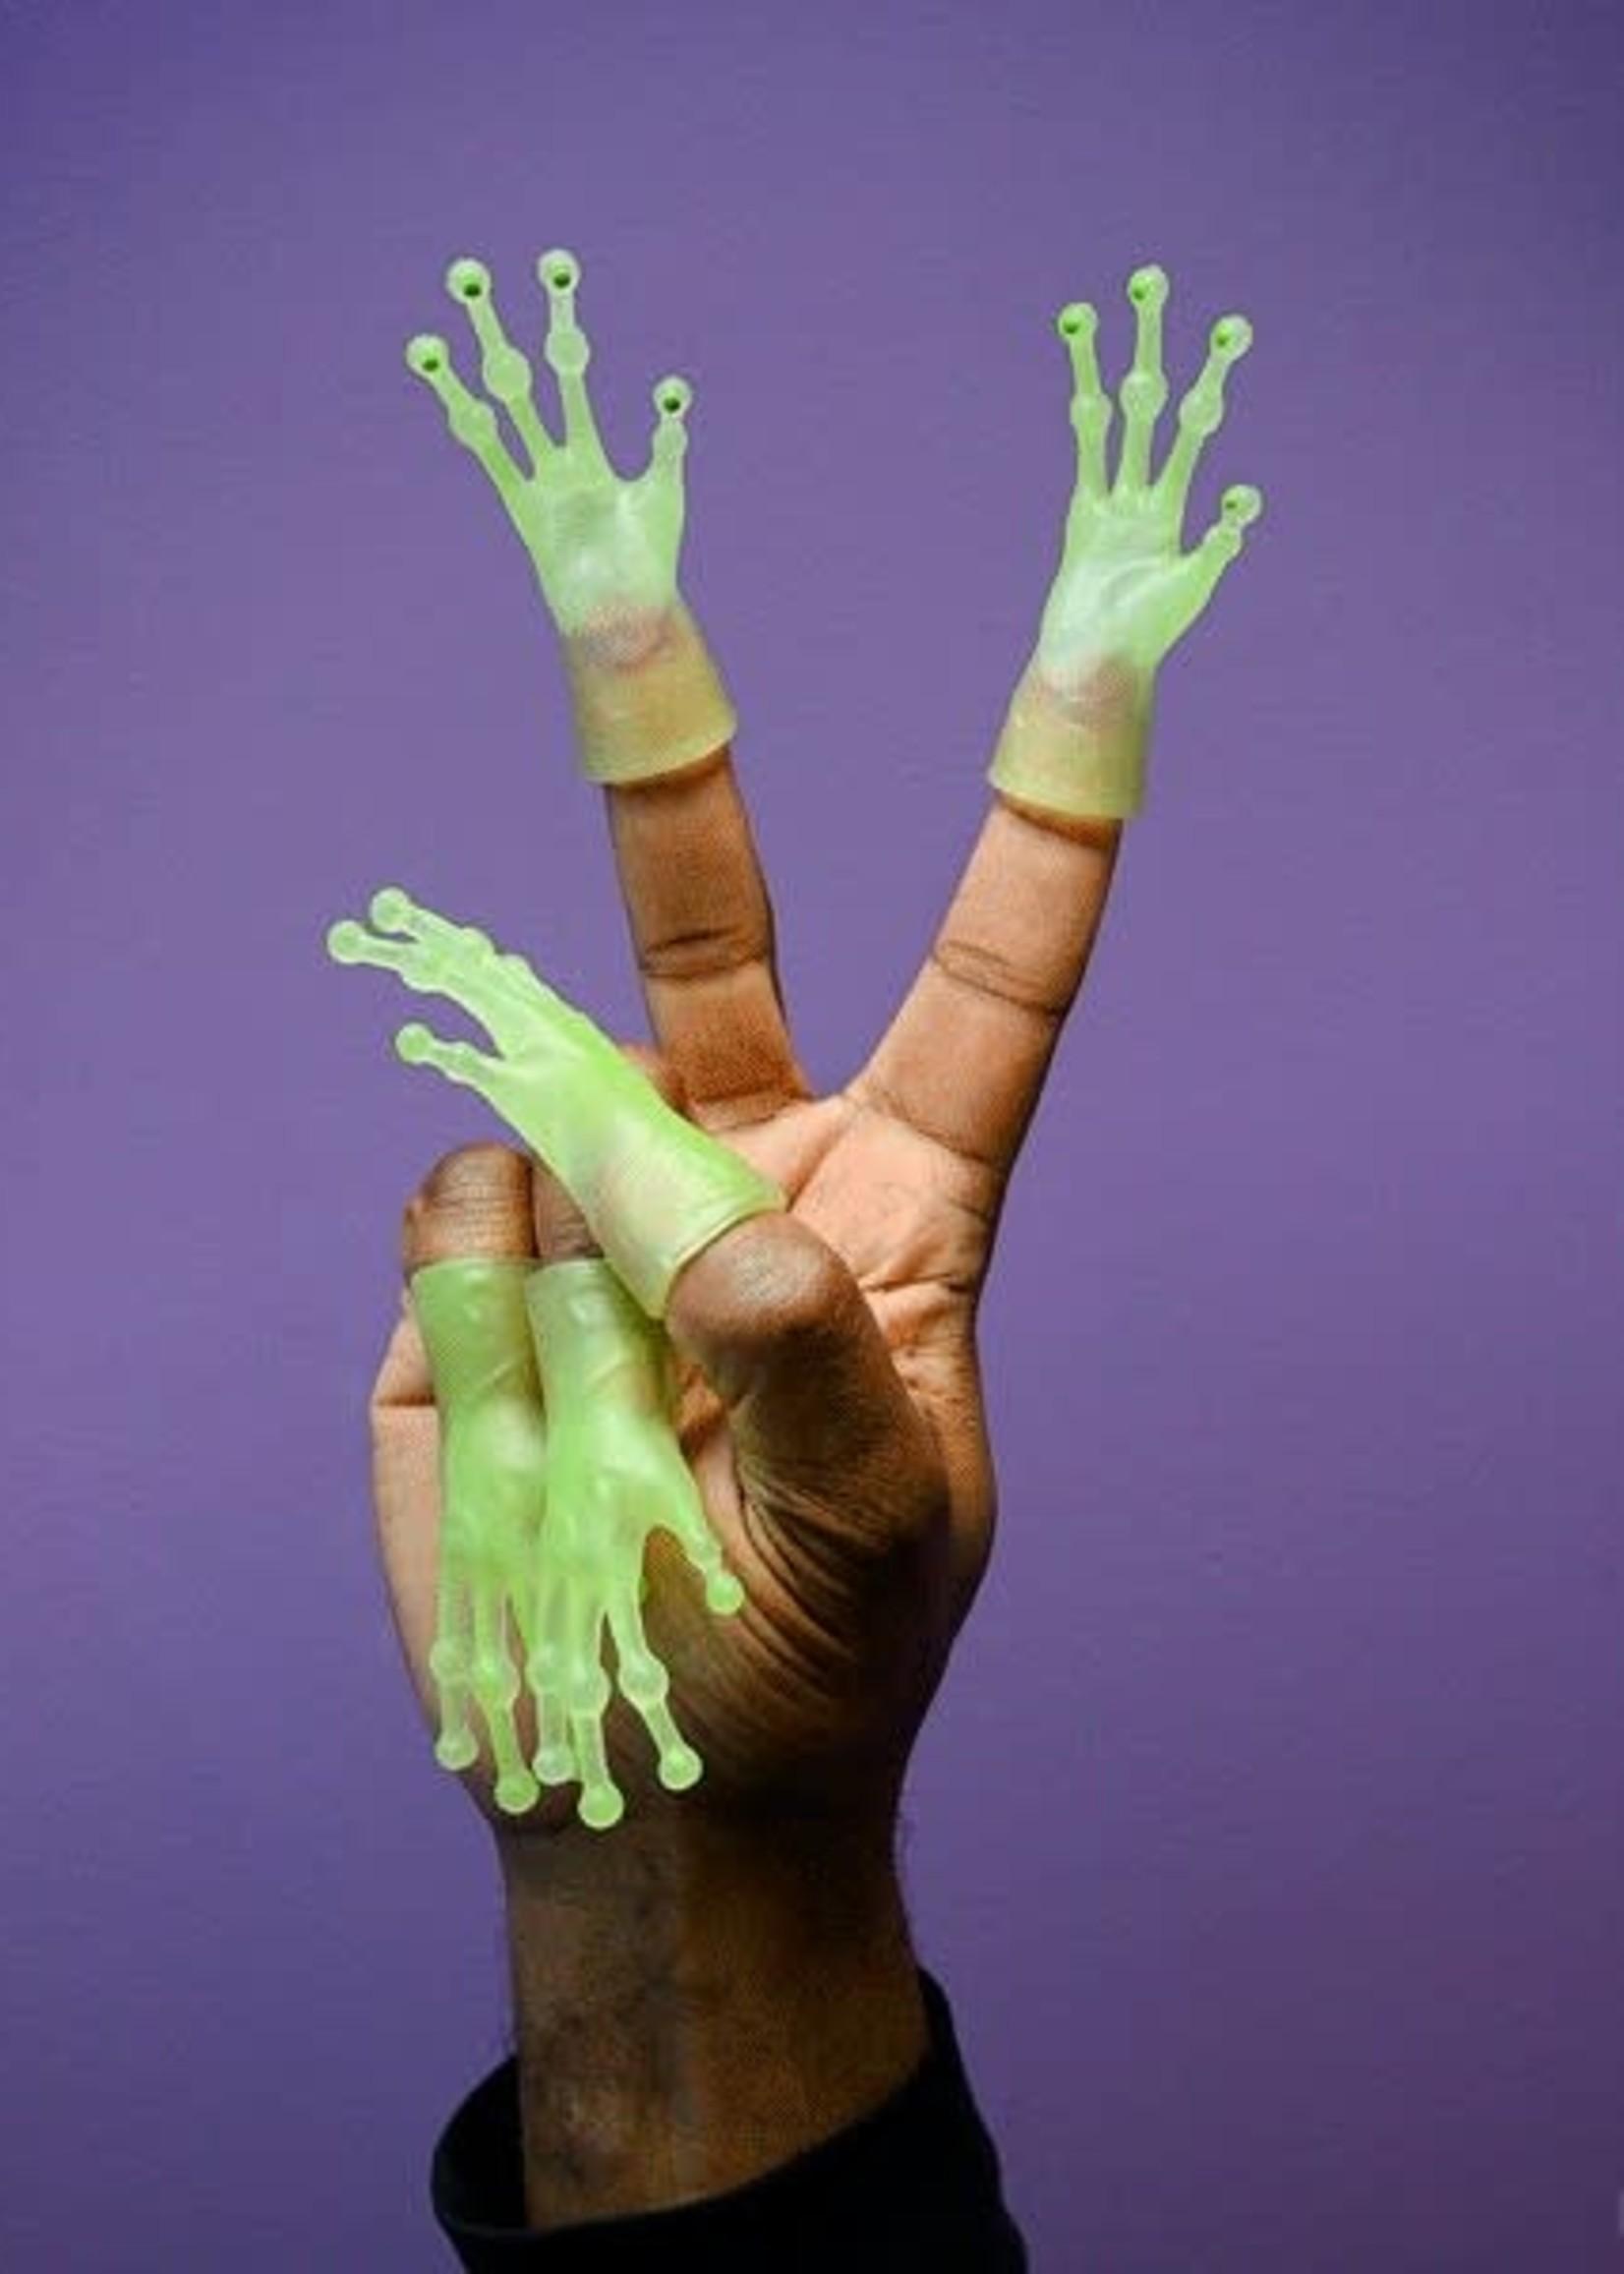 ARCHIE MCPHEE ALIEN GLOWING FINGER HAND